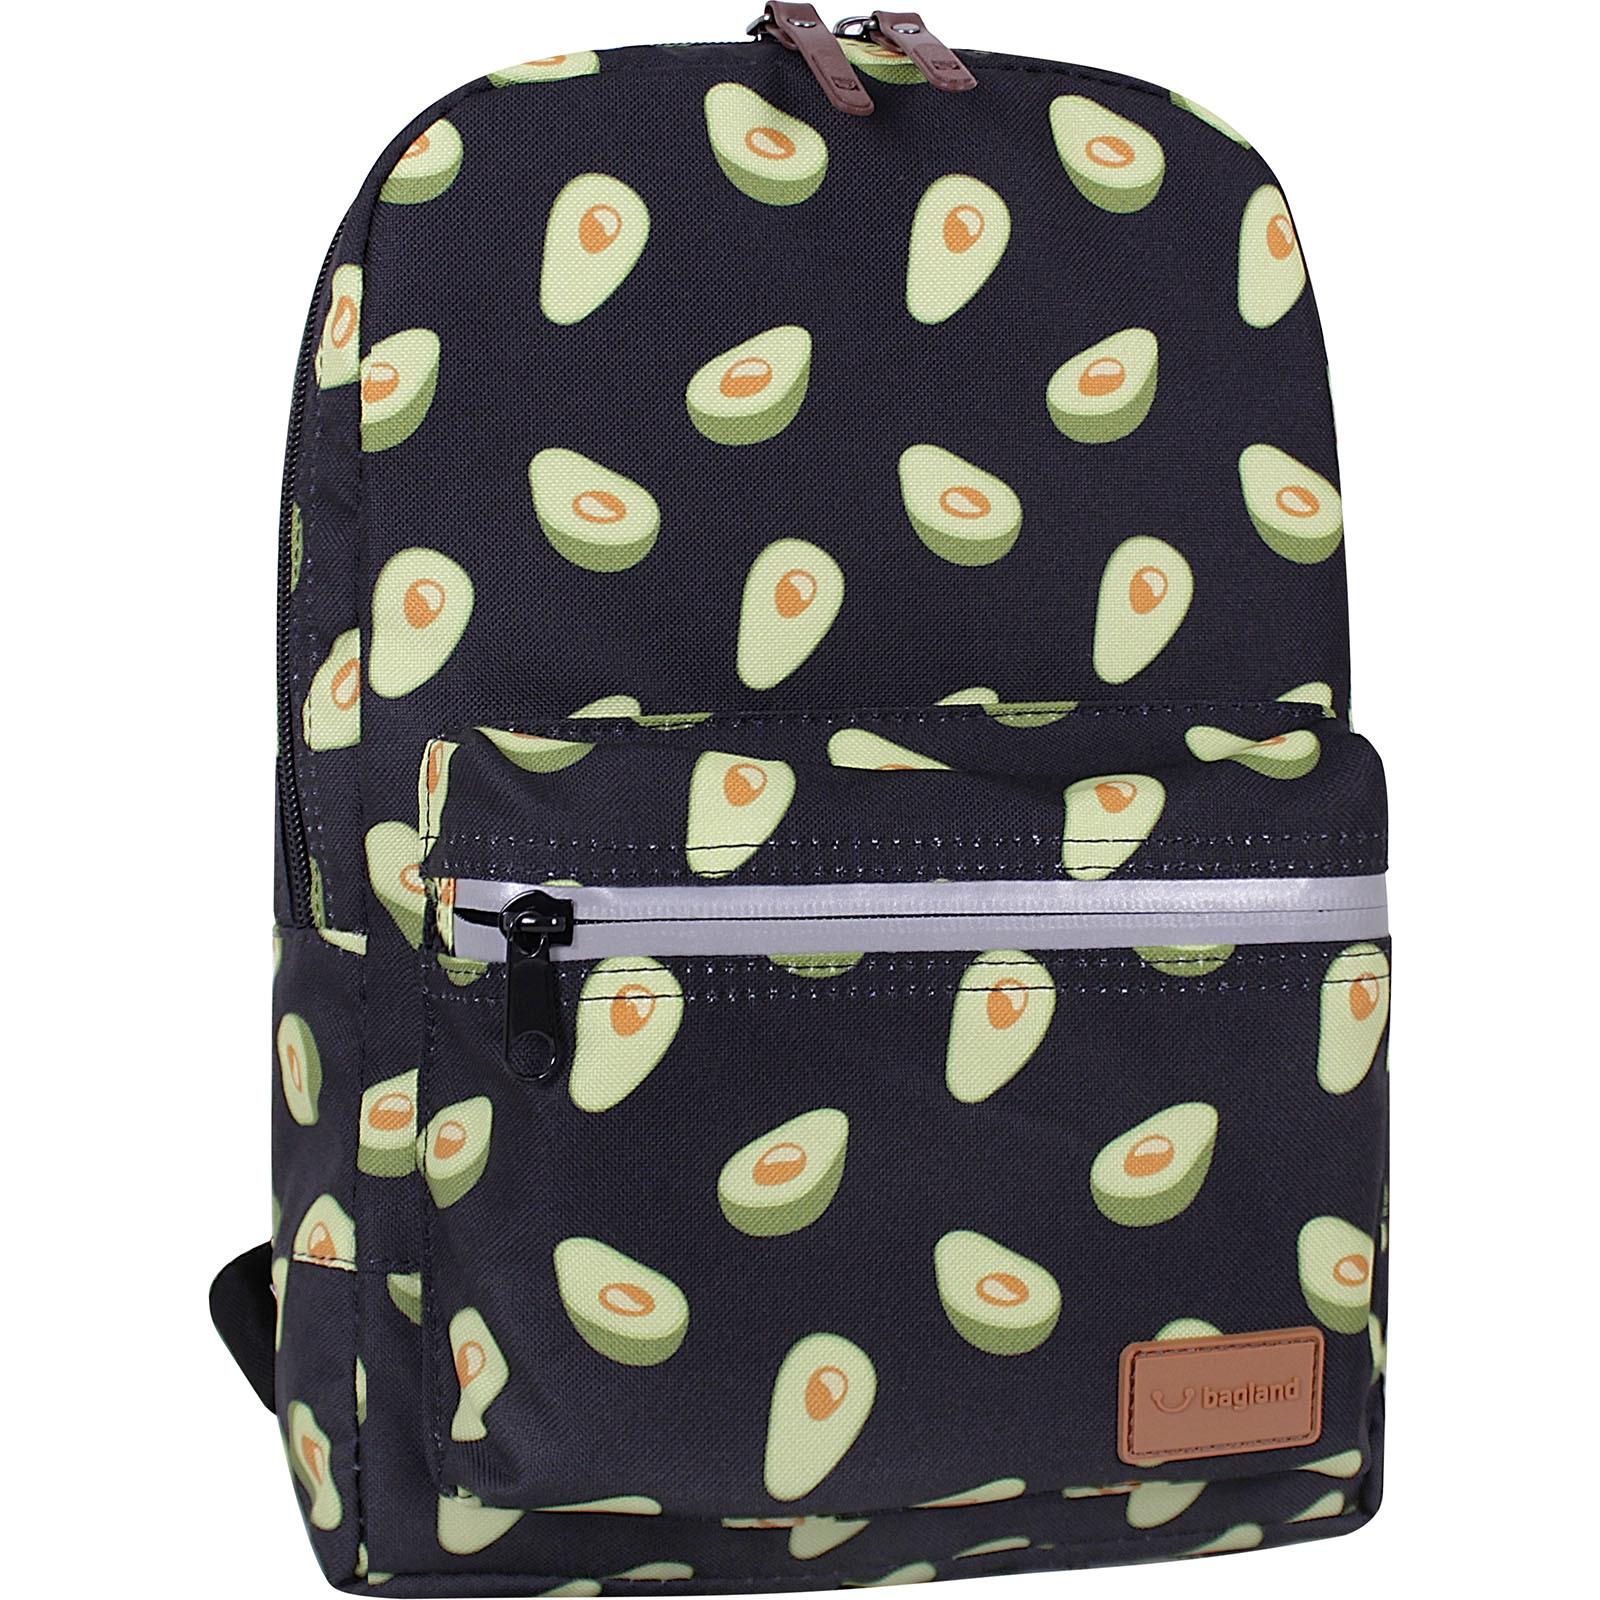 Молодежные рюкзаки Рюкзак Bagland Молодежный mini 8 л. сублимация 763 (00508664) IMG_1881суб.763.JPG